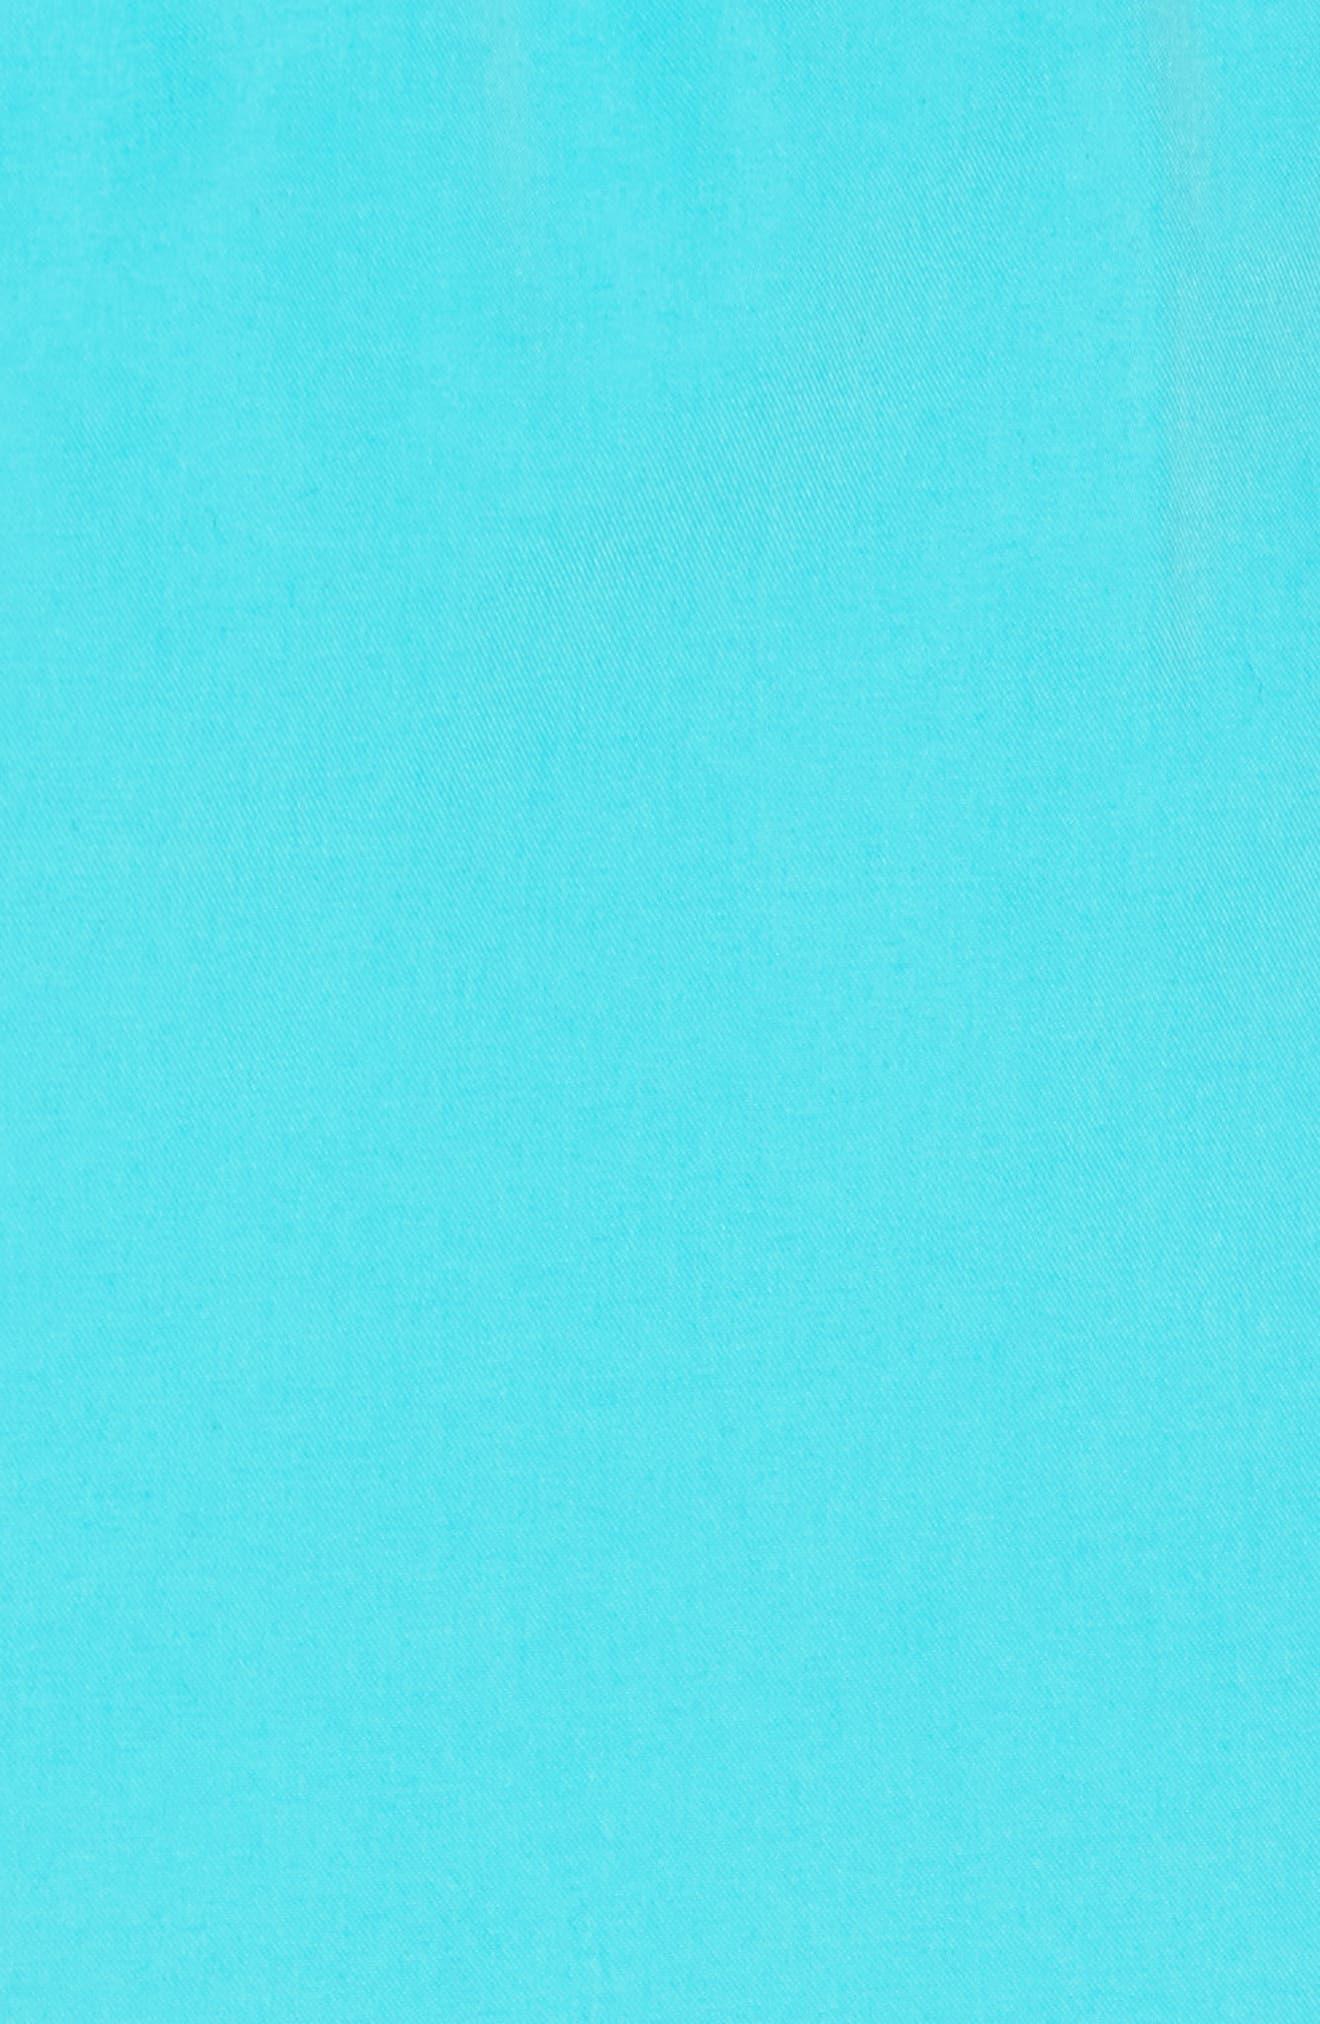 Solid Swim Trunks,                             Alternate thumbnail 5, color,                             Pool Blue